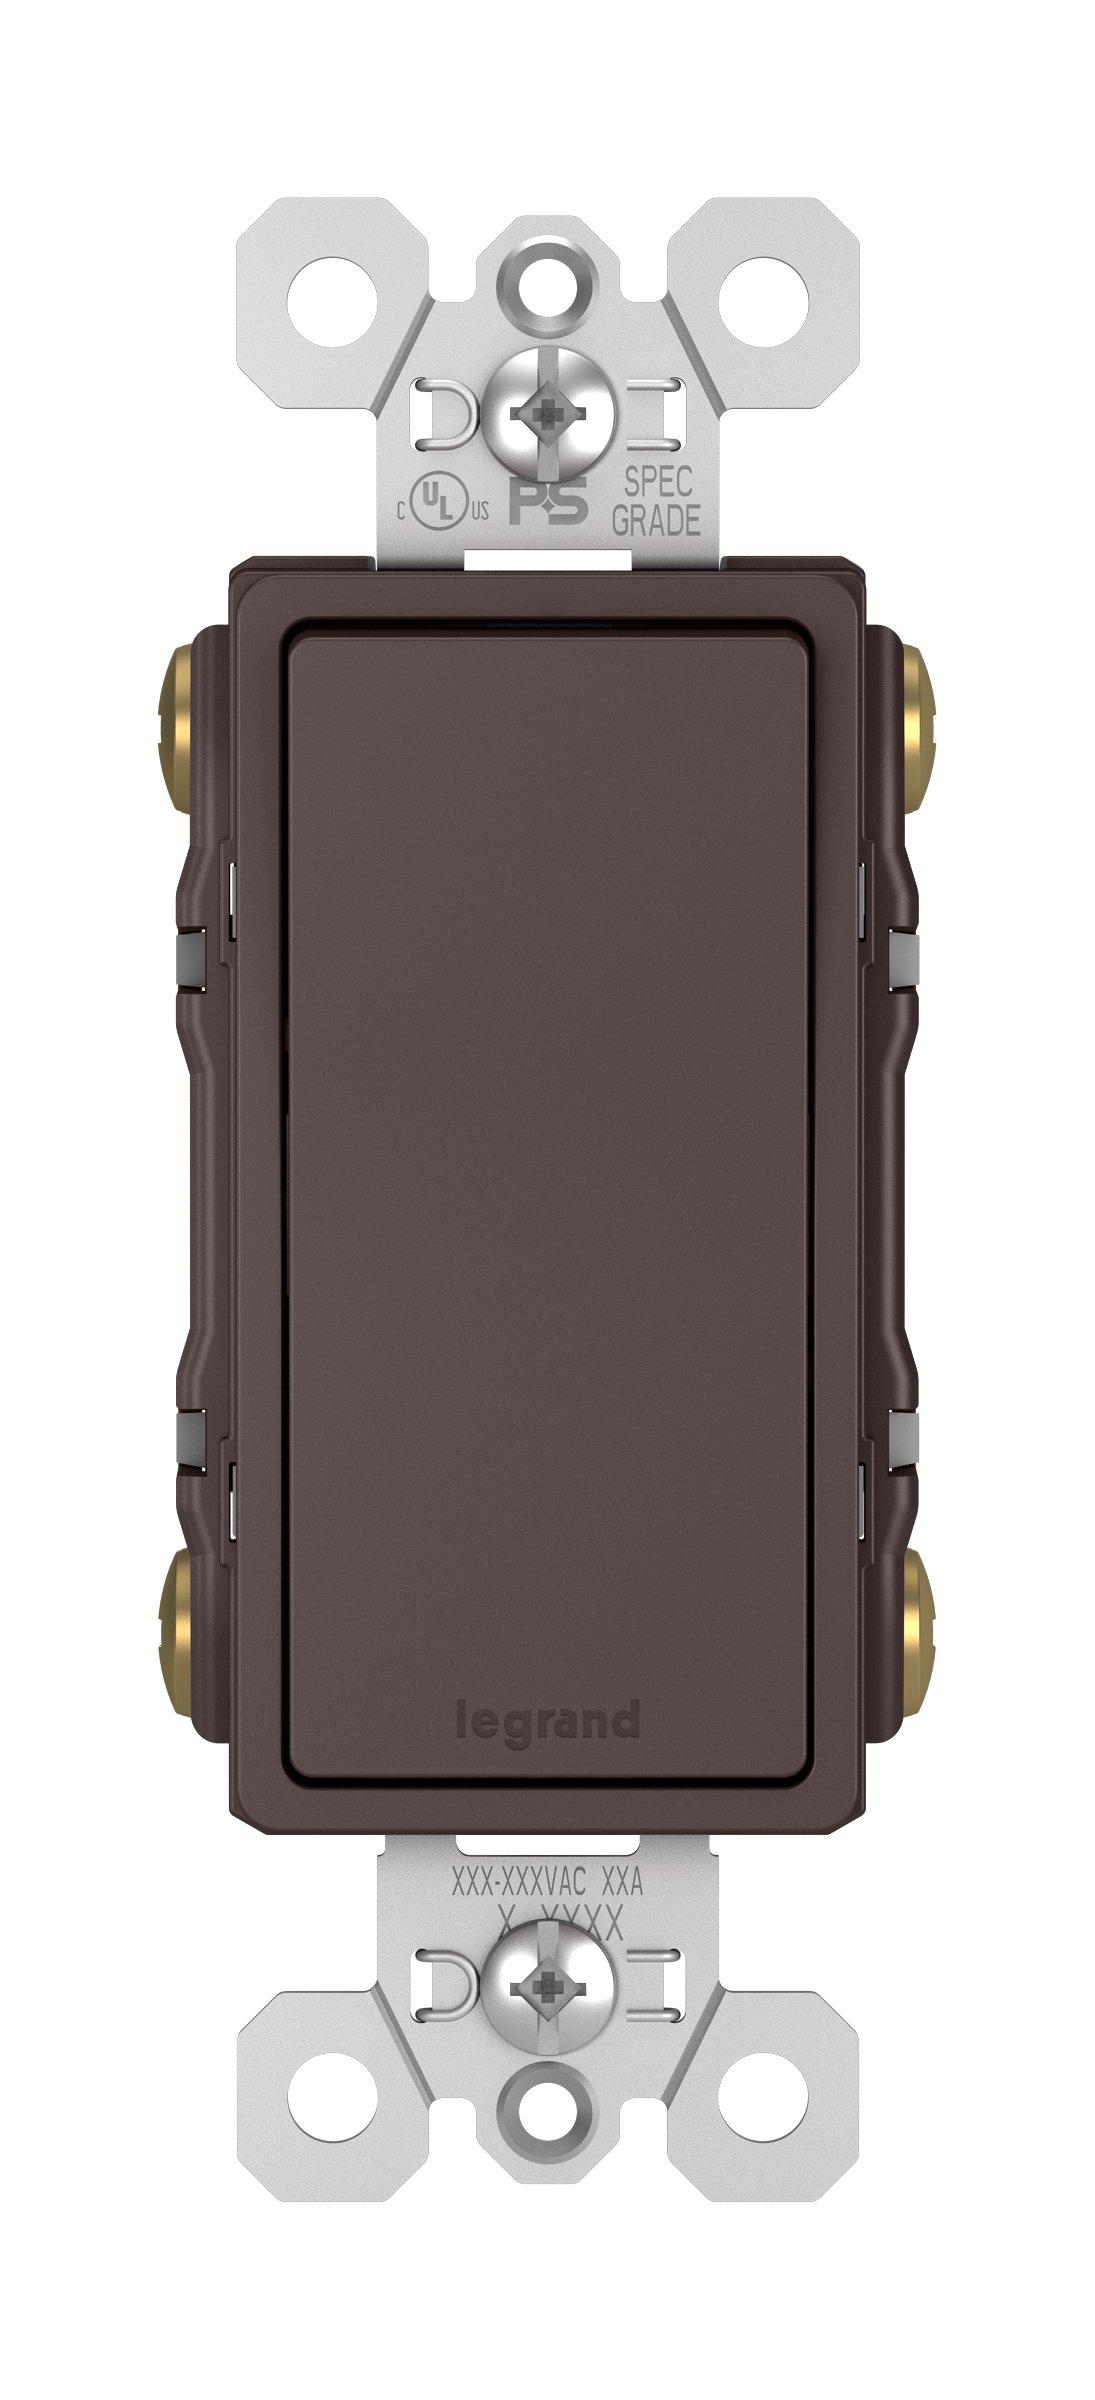 Legrand - Pass & Seymour TM874DBCC6 15A 4-Way Decorative Switch, Bronze